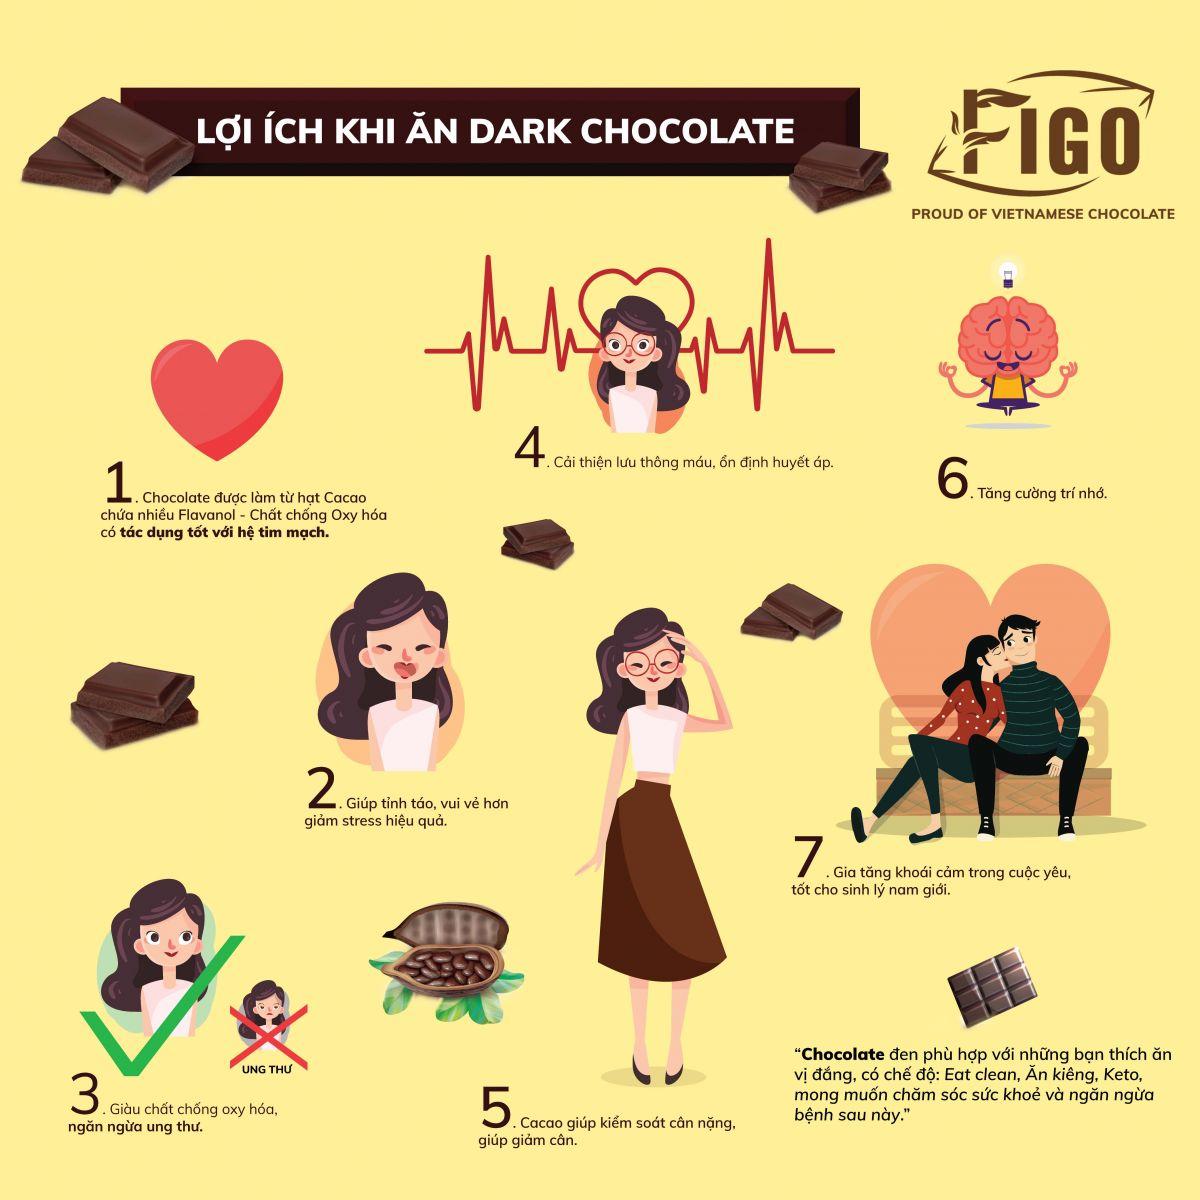 (Bar 100g) Socola đen 85% cacao ít đường100g Figo - Kẹo Socola thanh Việt nam